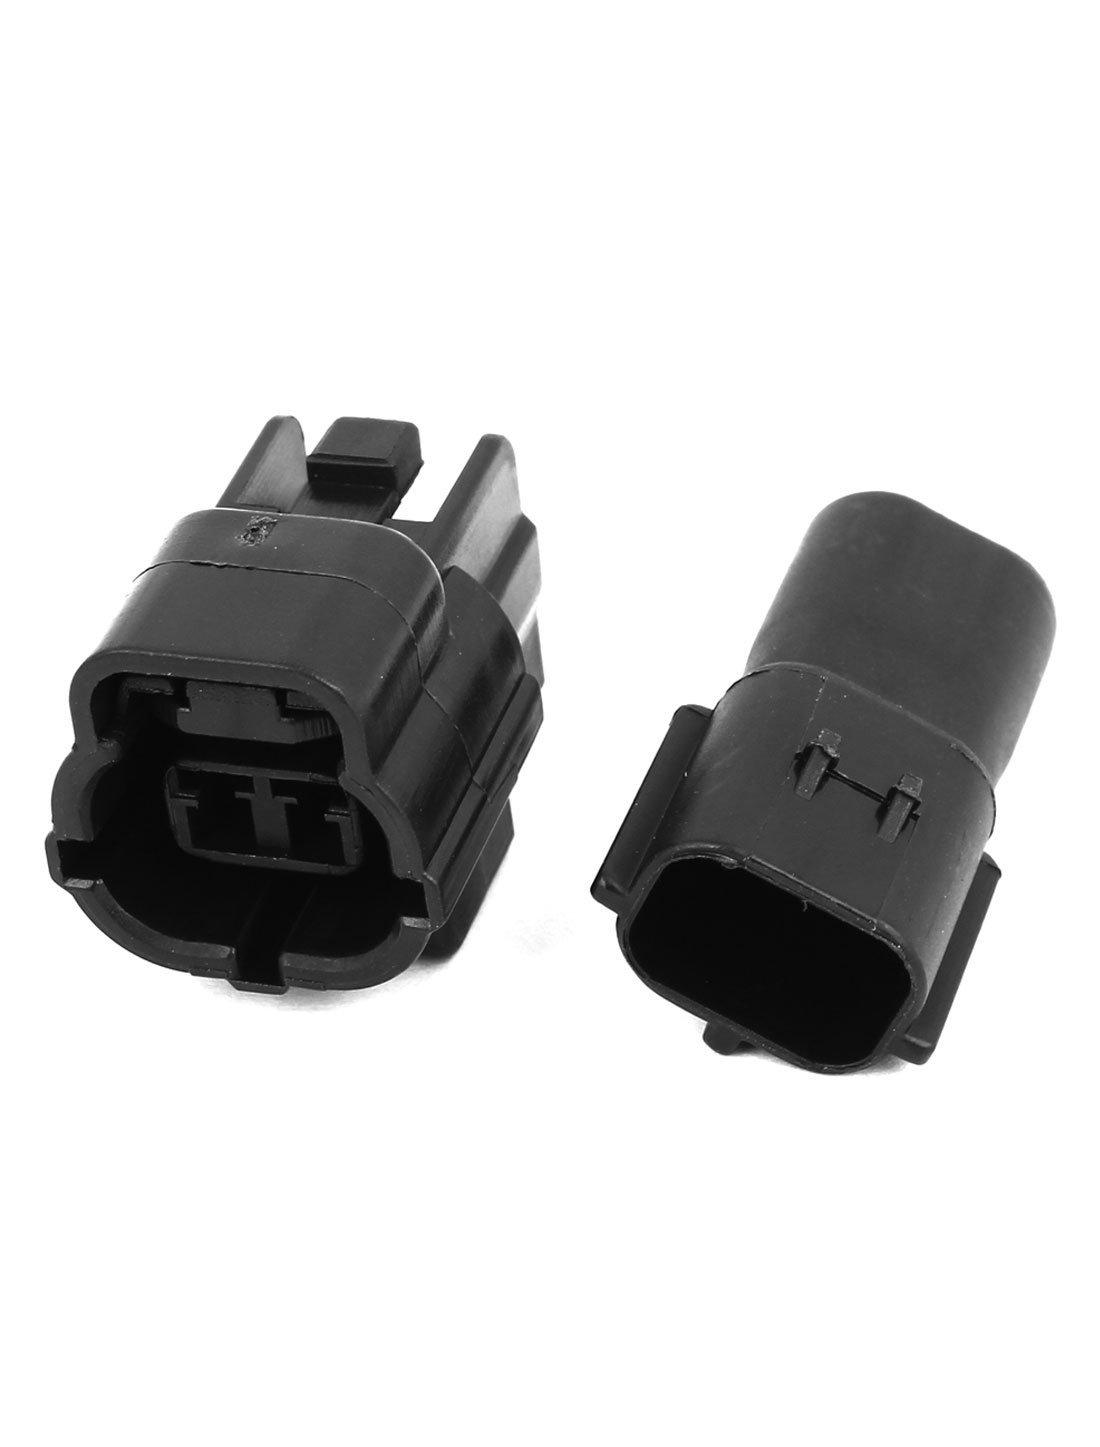 Amazon.com: eDealMax 2 Conjunto DE 2 vías Sellado conectores de Cable a prueba de agua: Car Electronics